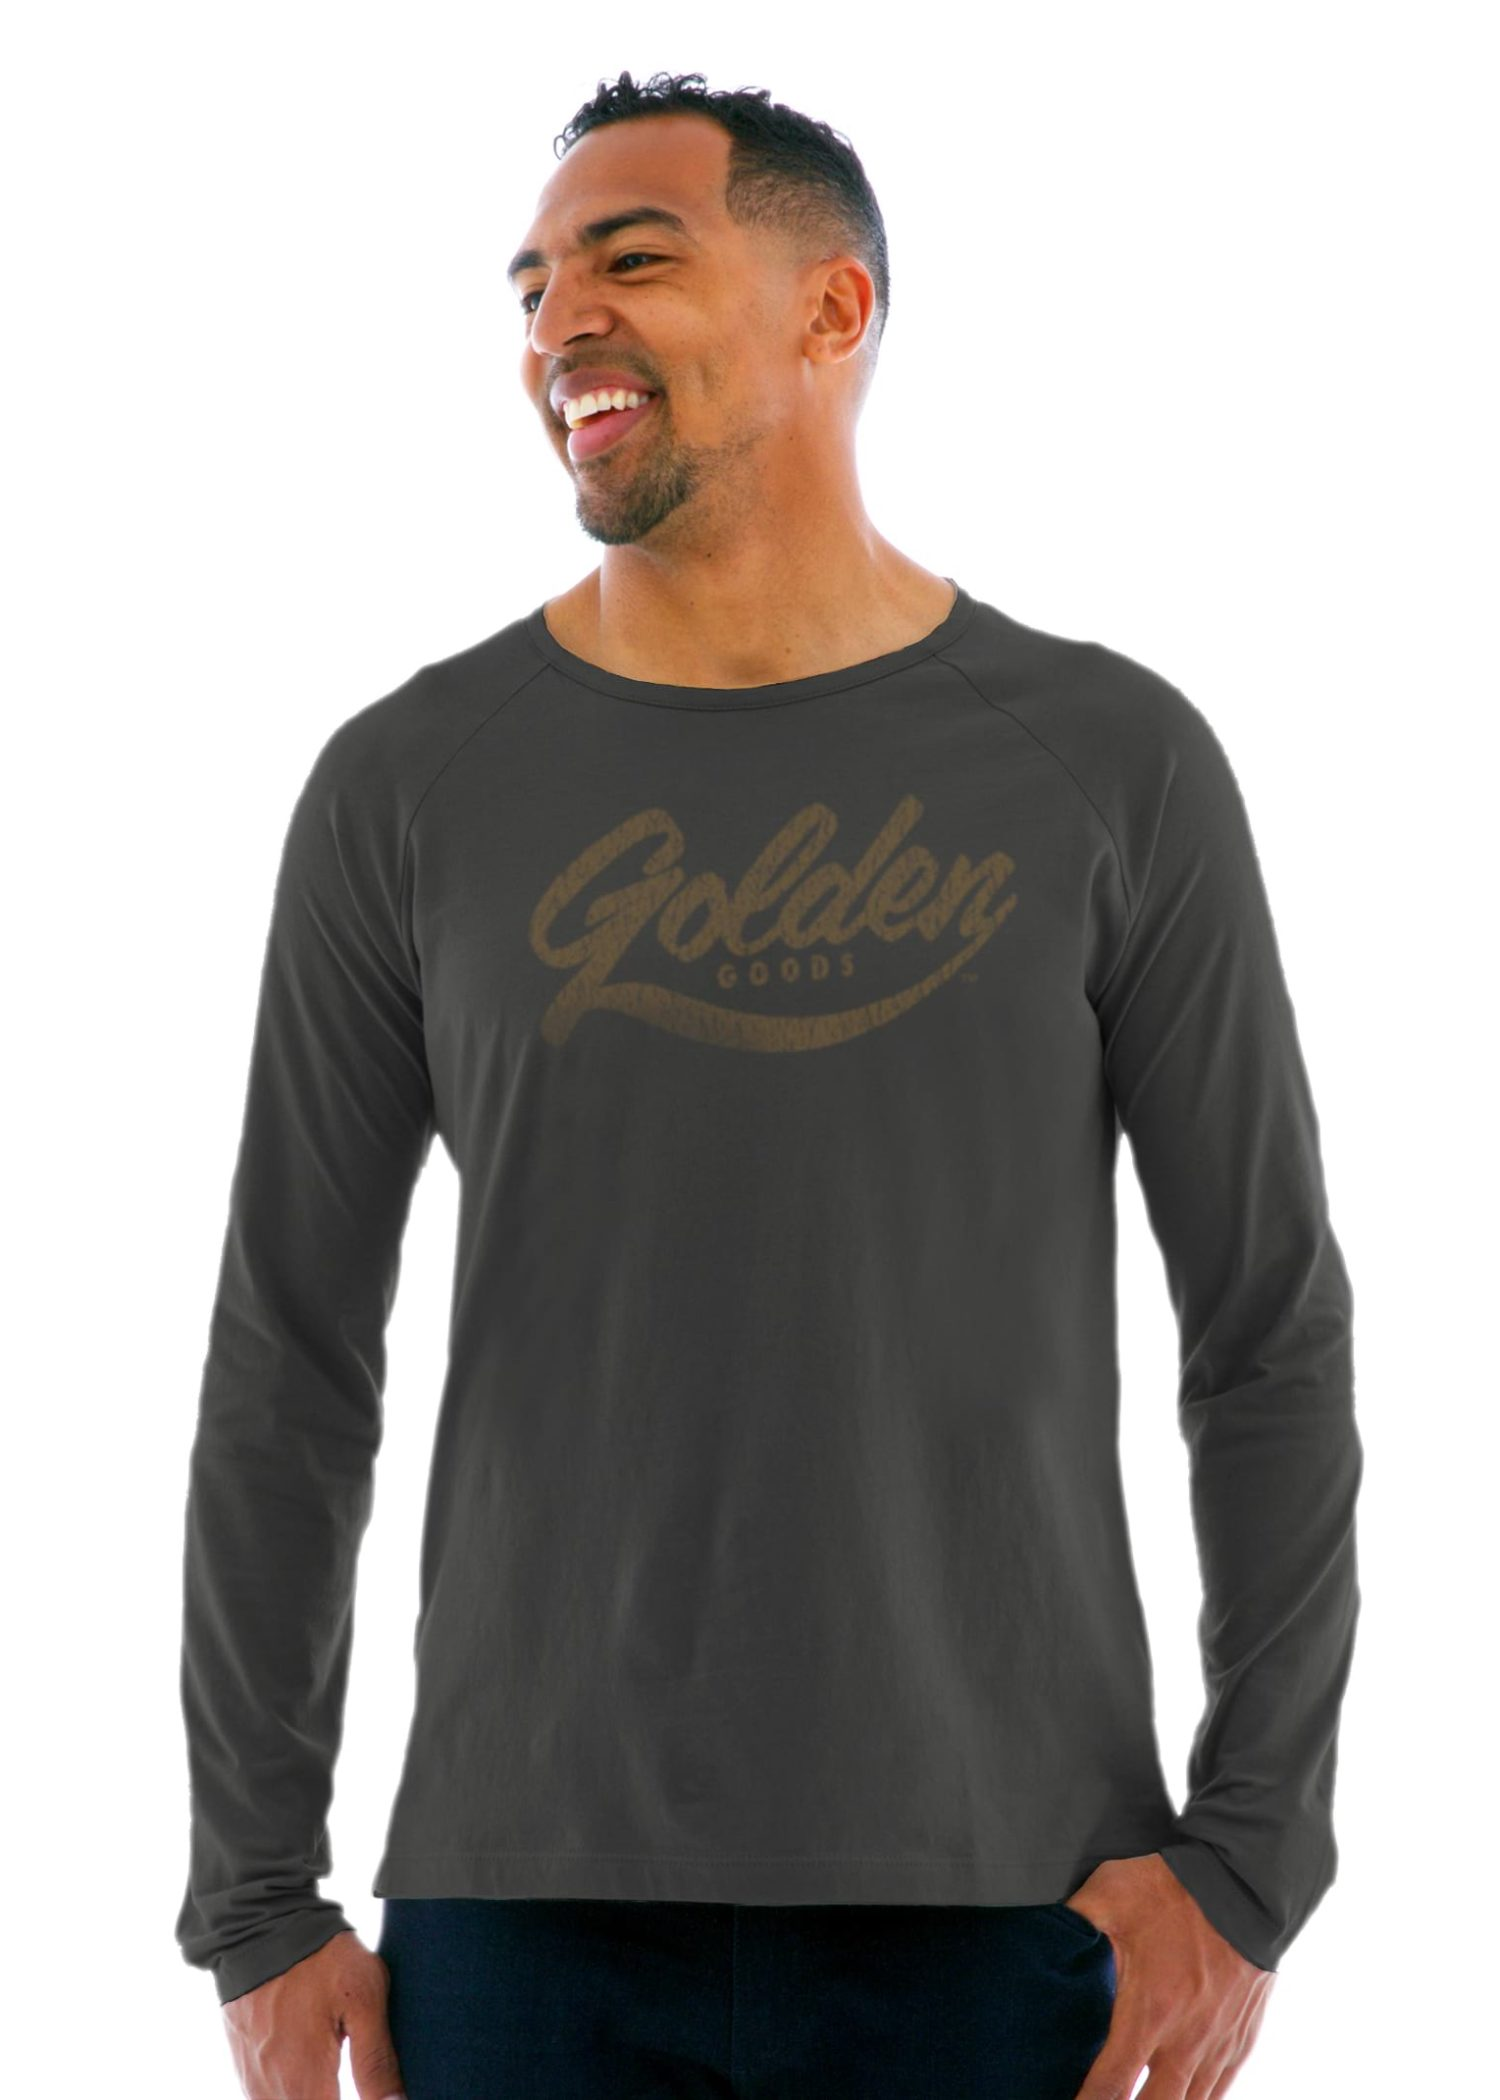 Men's Long Sleeve Raglan Crew T-Shirt